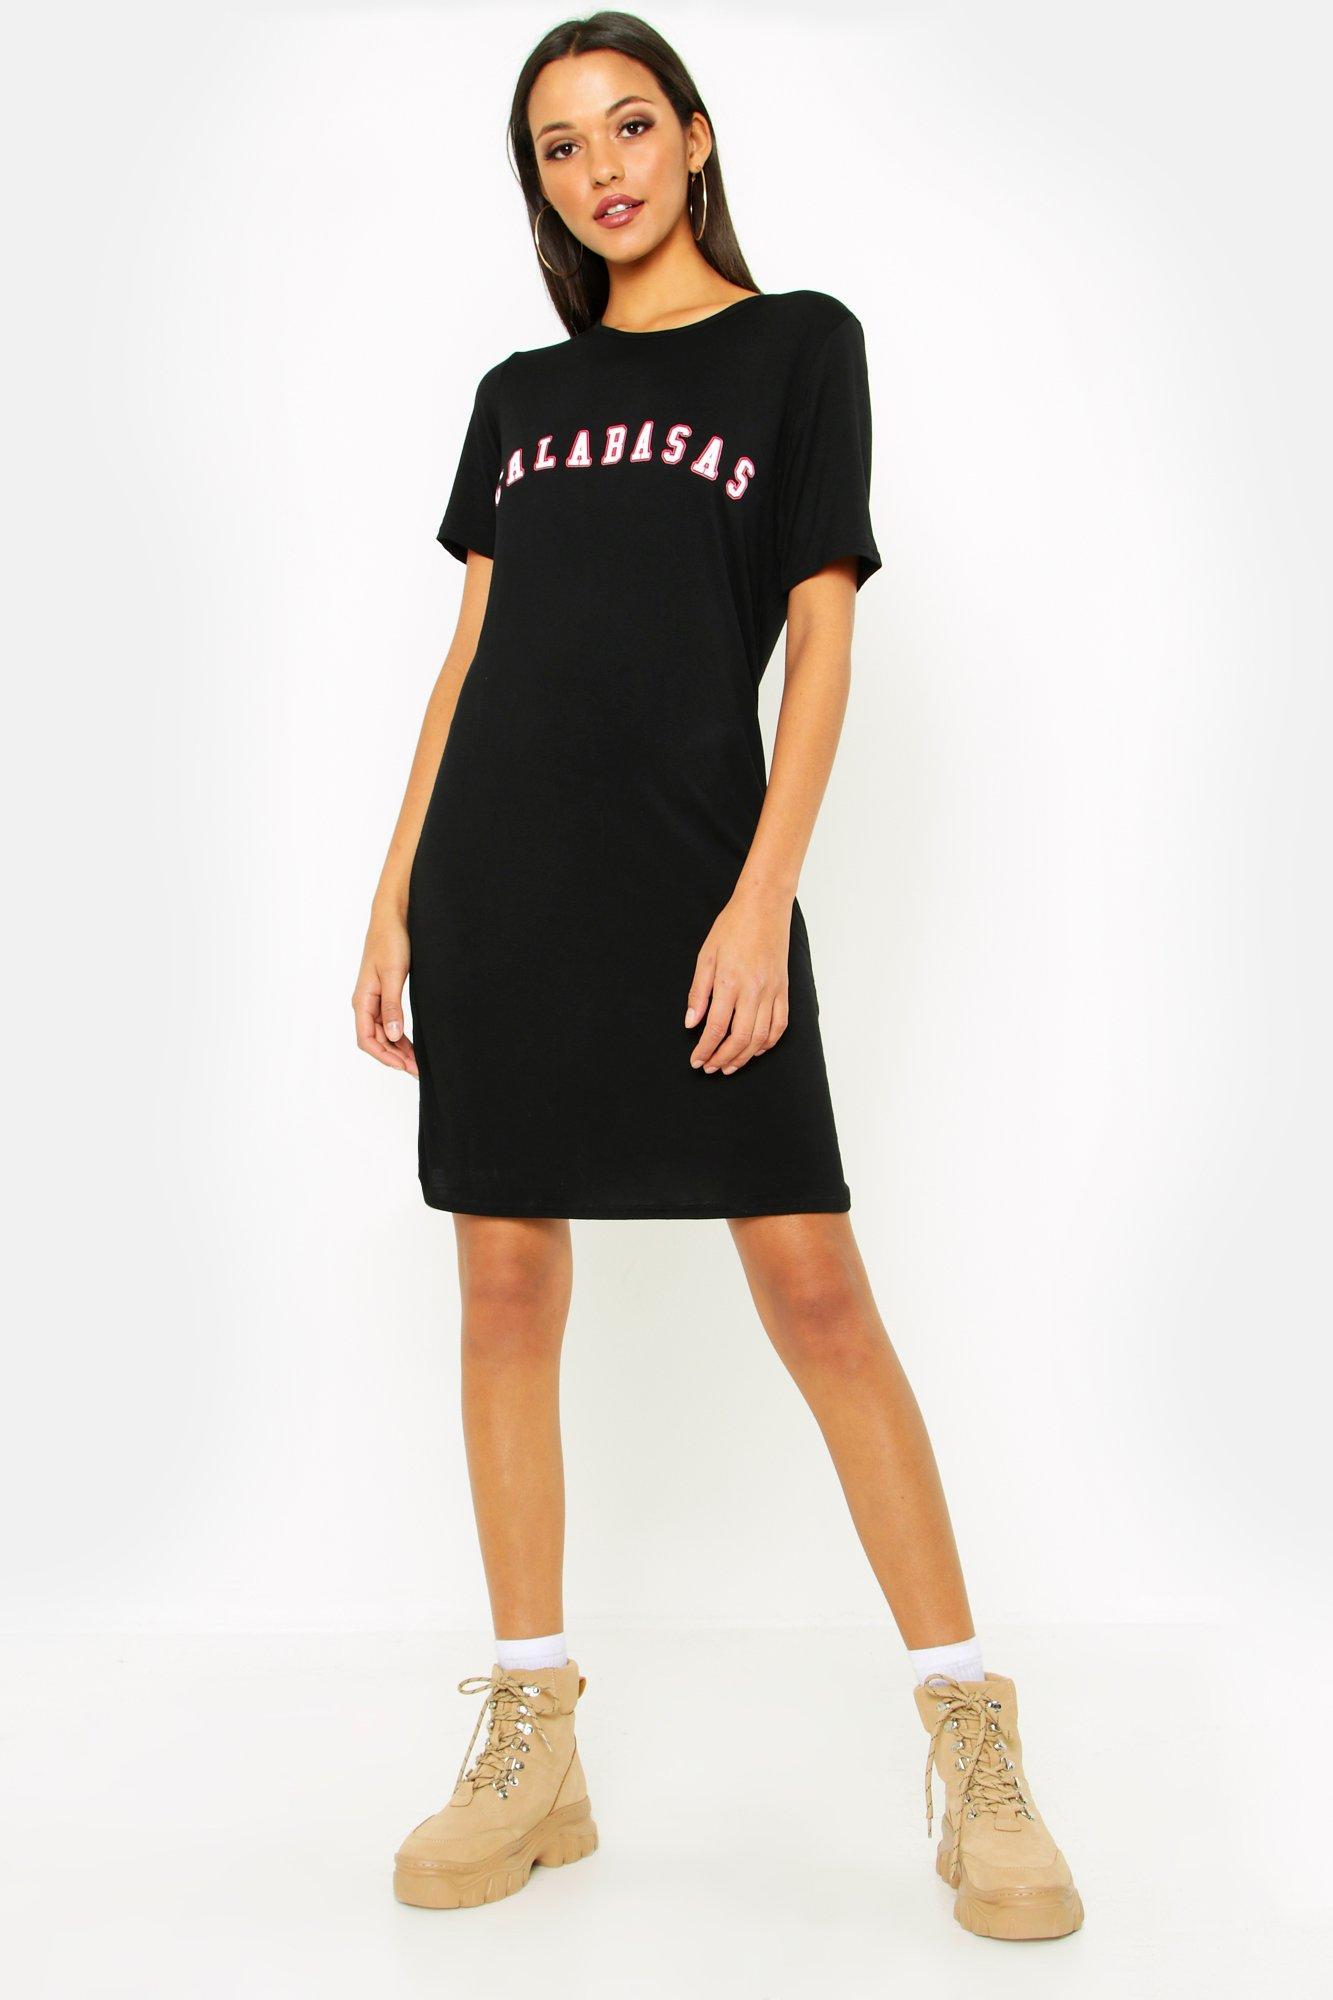 Tall Calabasas Slogan T-Shirt Dress